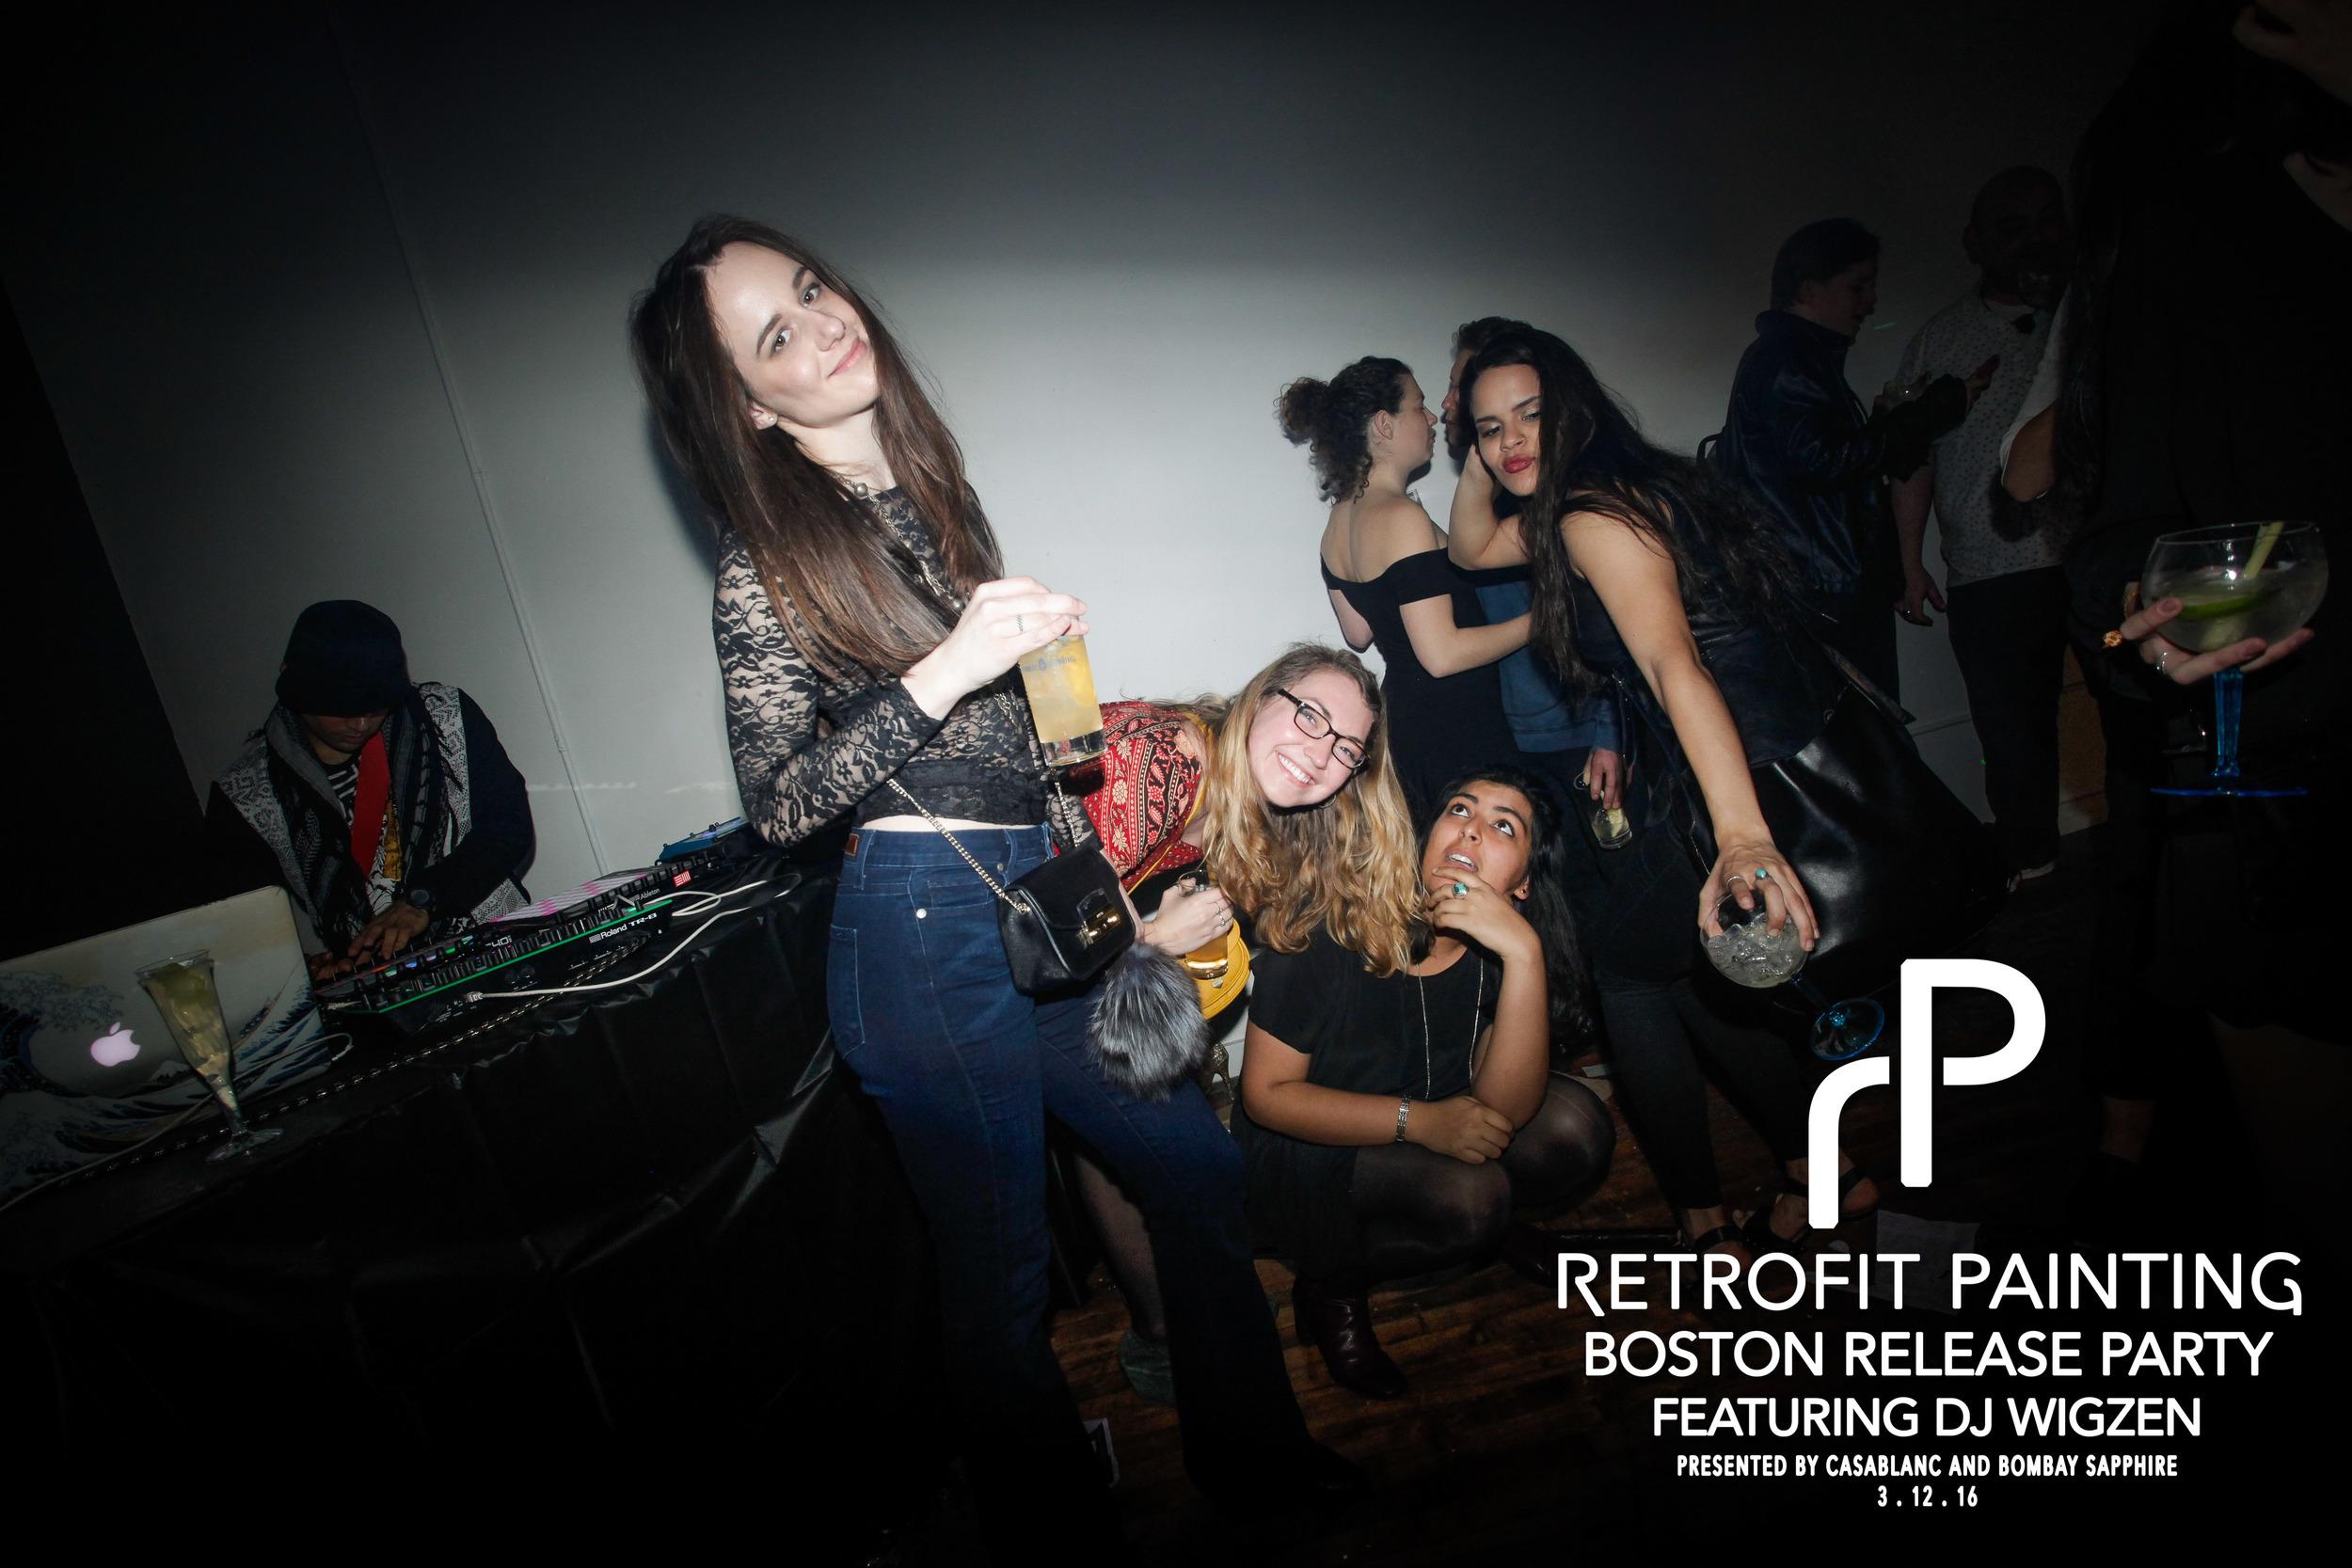 Retrofit Painting Boston Release Party 0145.jpg